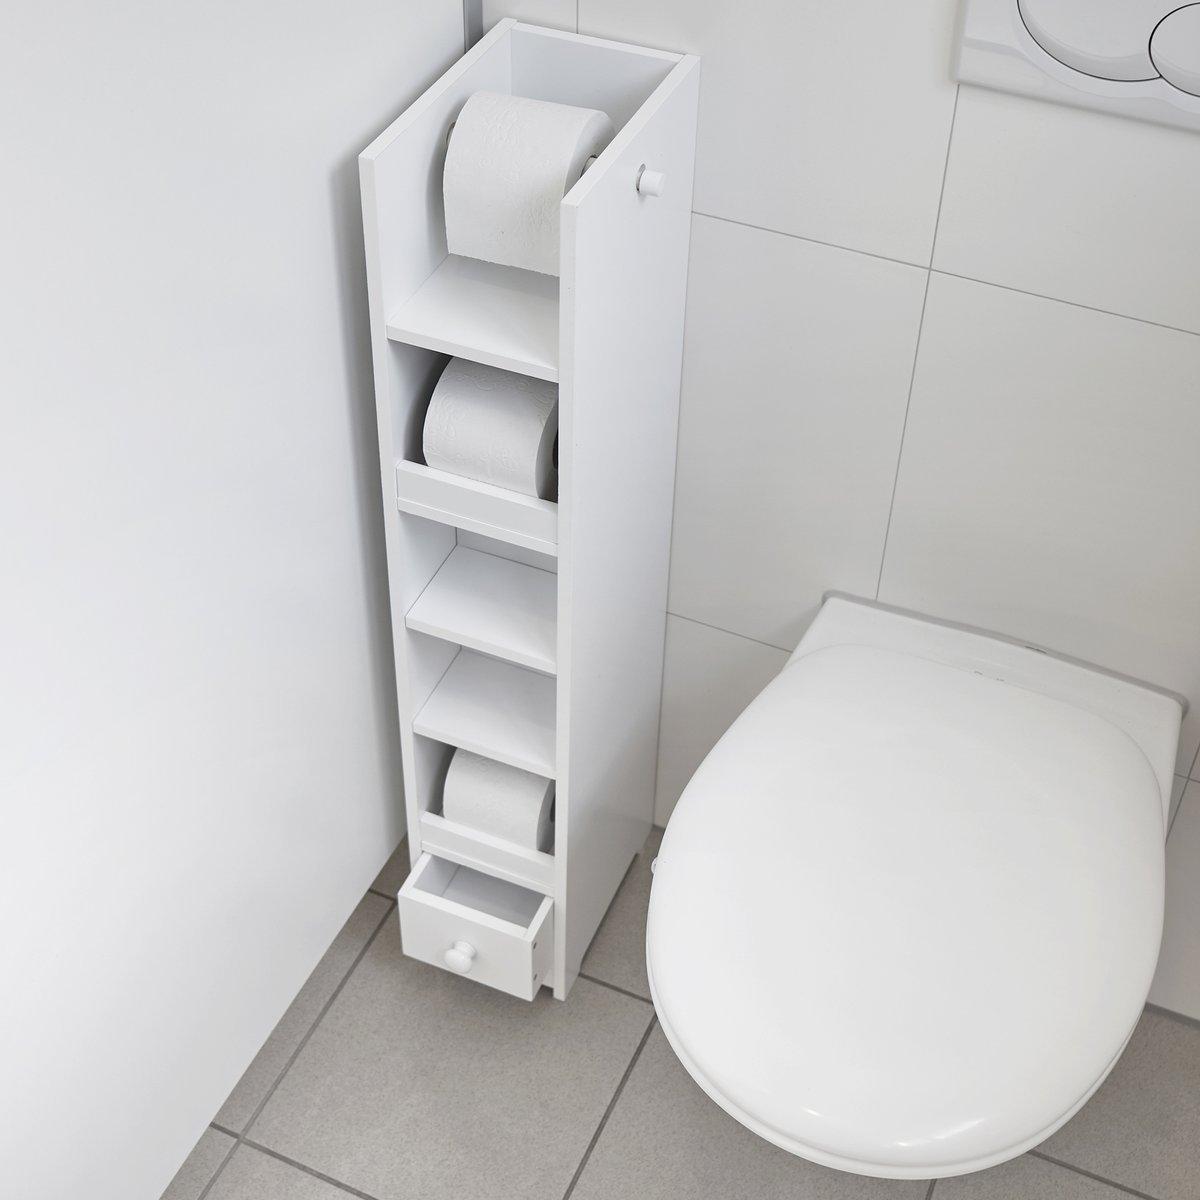 Genialo Wc Papier Regal Modernes Badezimmer Wc Regal Fur